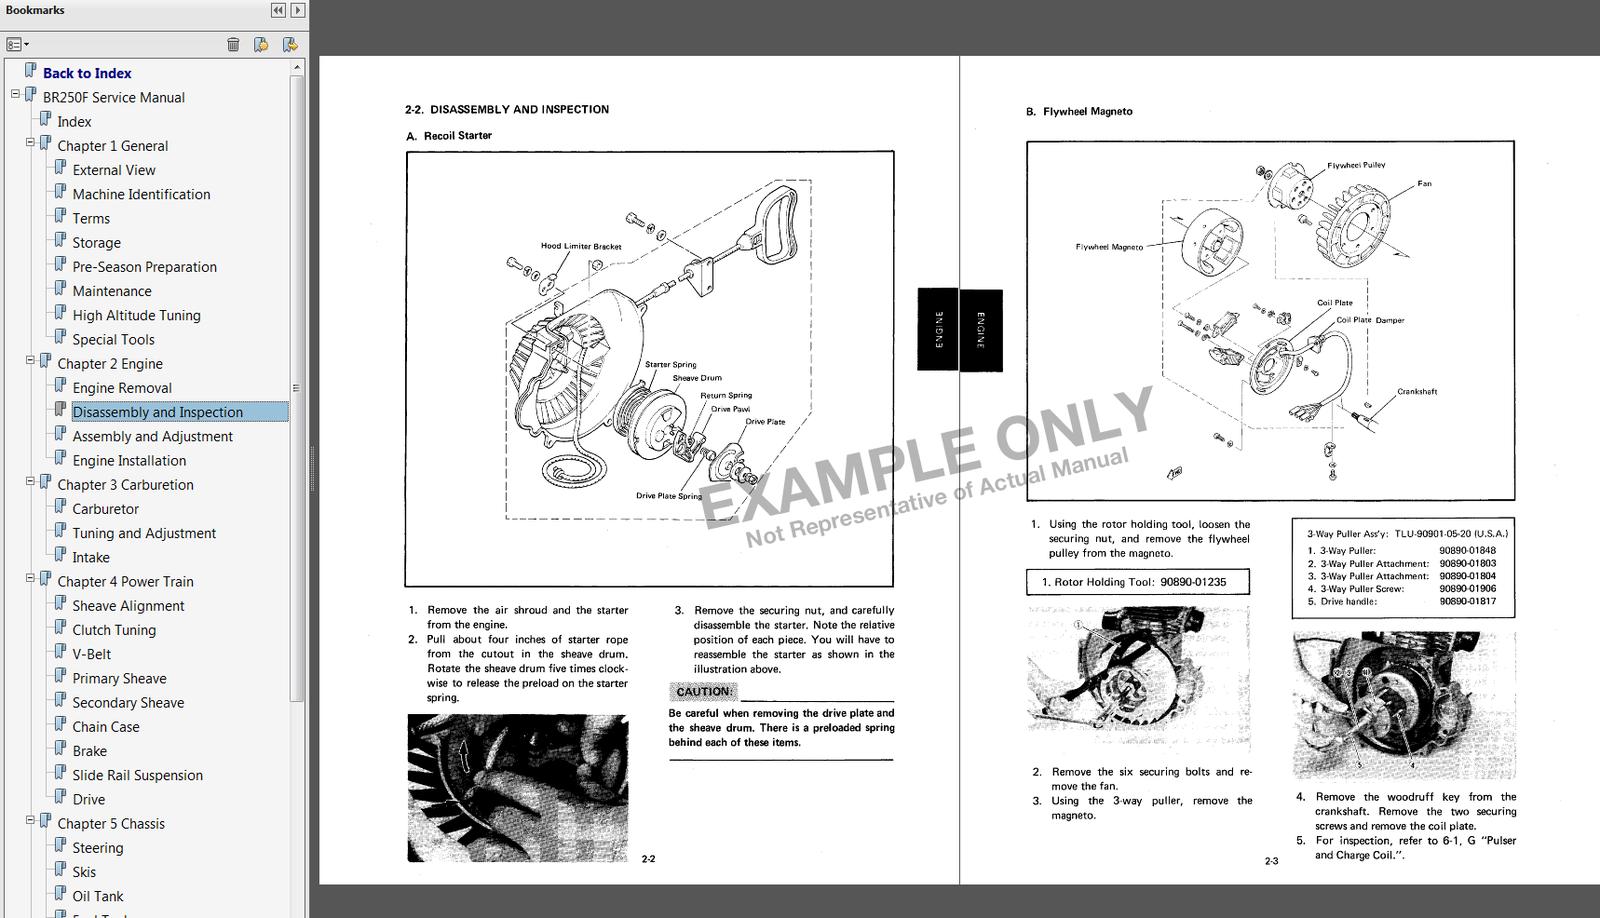 1994 600 snowmobile service manual